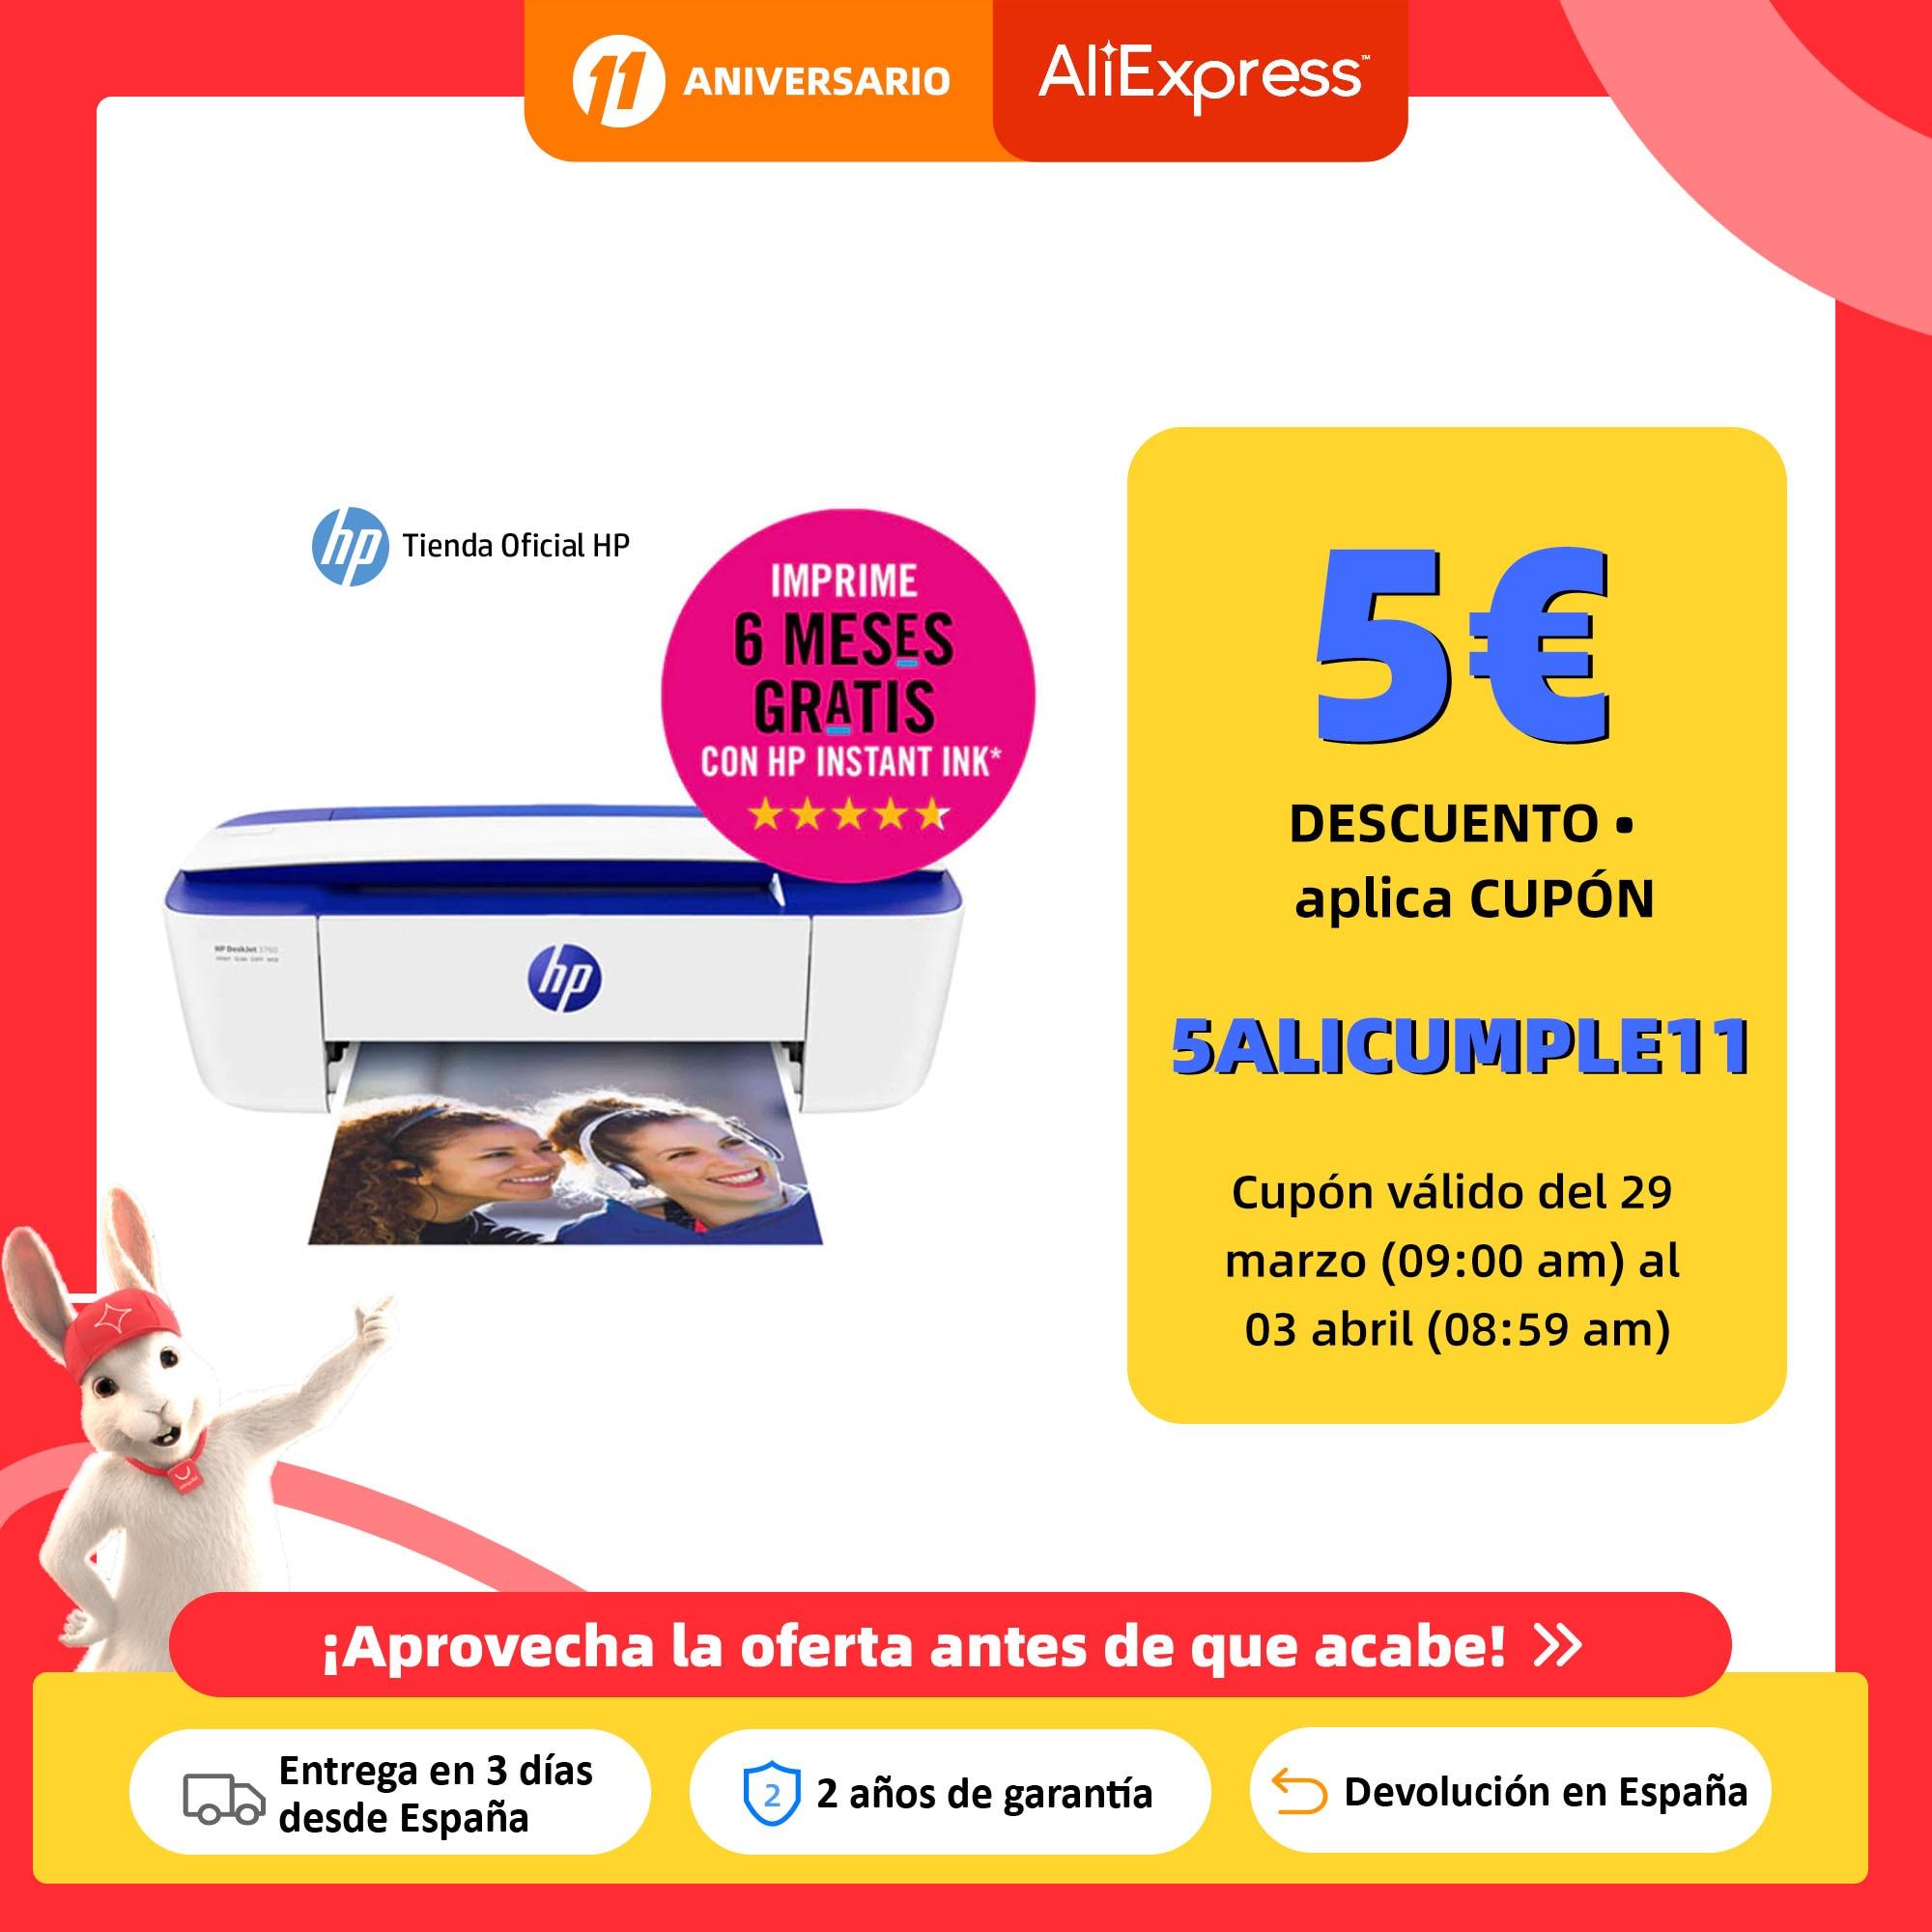 HP DeskJet 3760 (T8X19B), Impresora multifunción (imprime, escanea, copia, inyección de tinta, WiFi 802.11b/g/n integrada Impresoras  - AliExpress